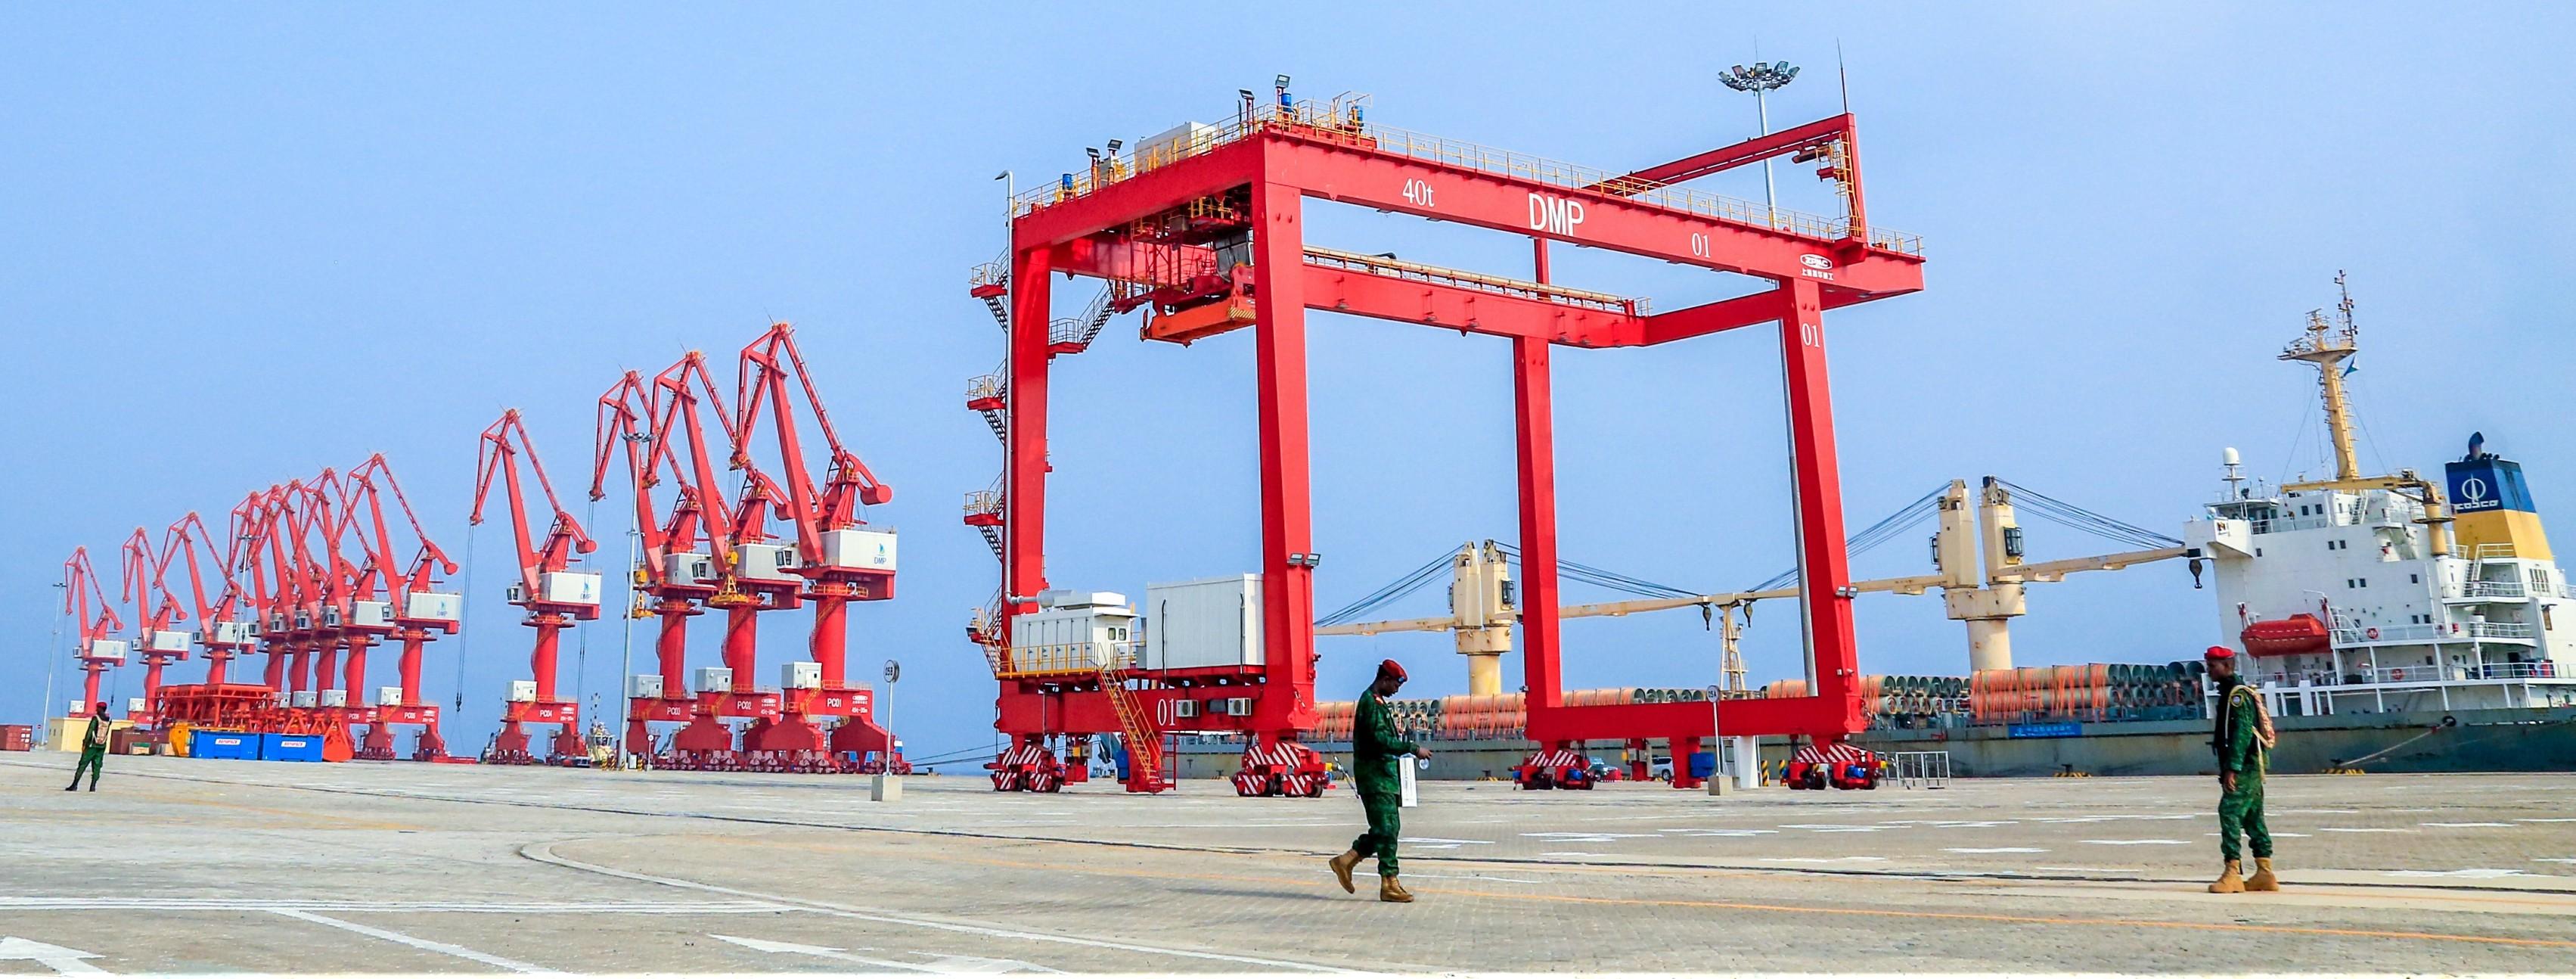 Djibouti Ports and Free Zones Authority (DPFZA) | LinkedIn